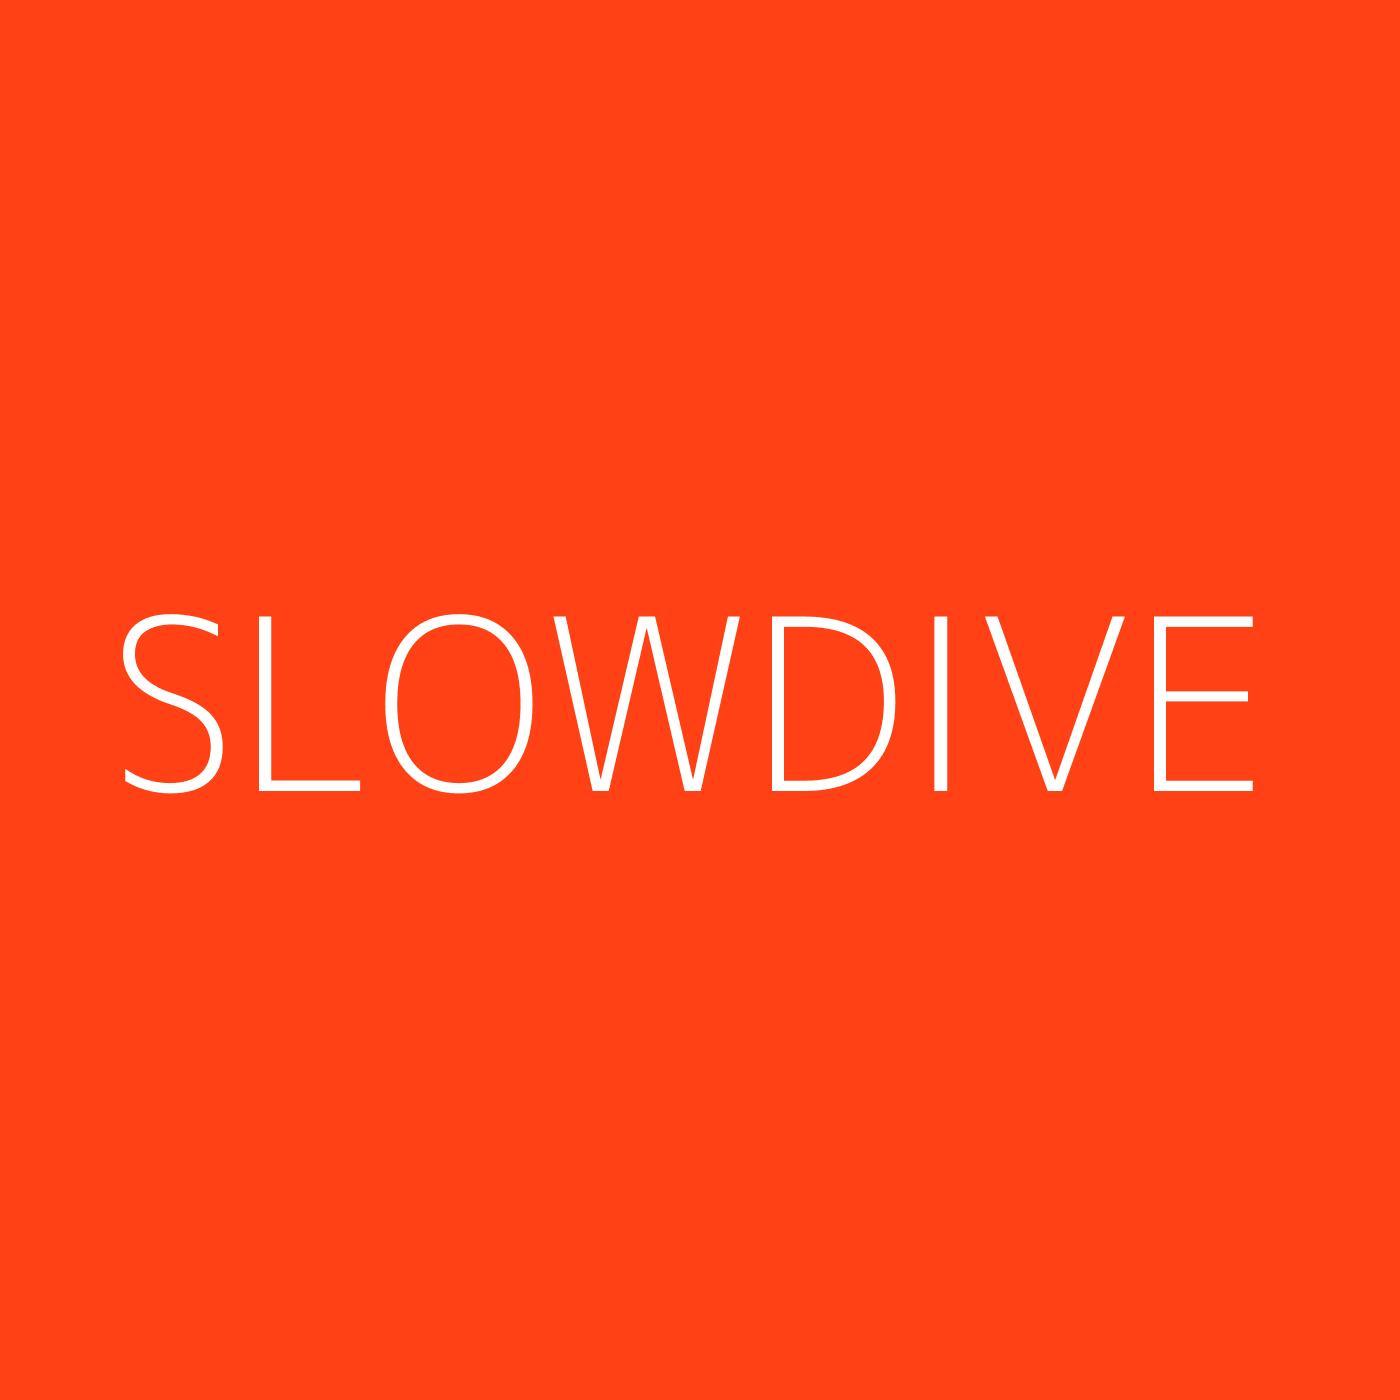 Slowdive Playlist Artwork